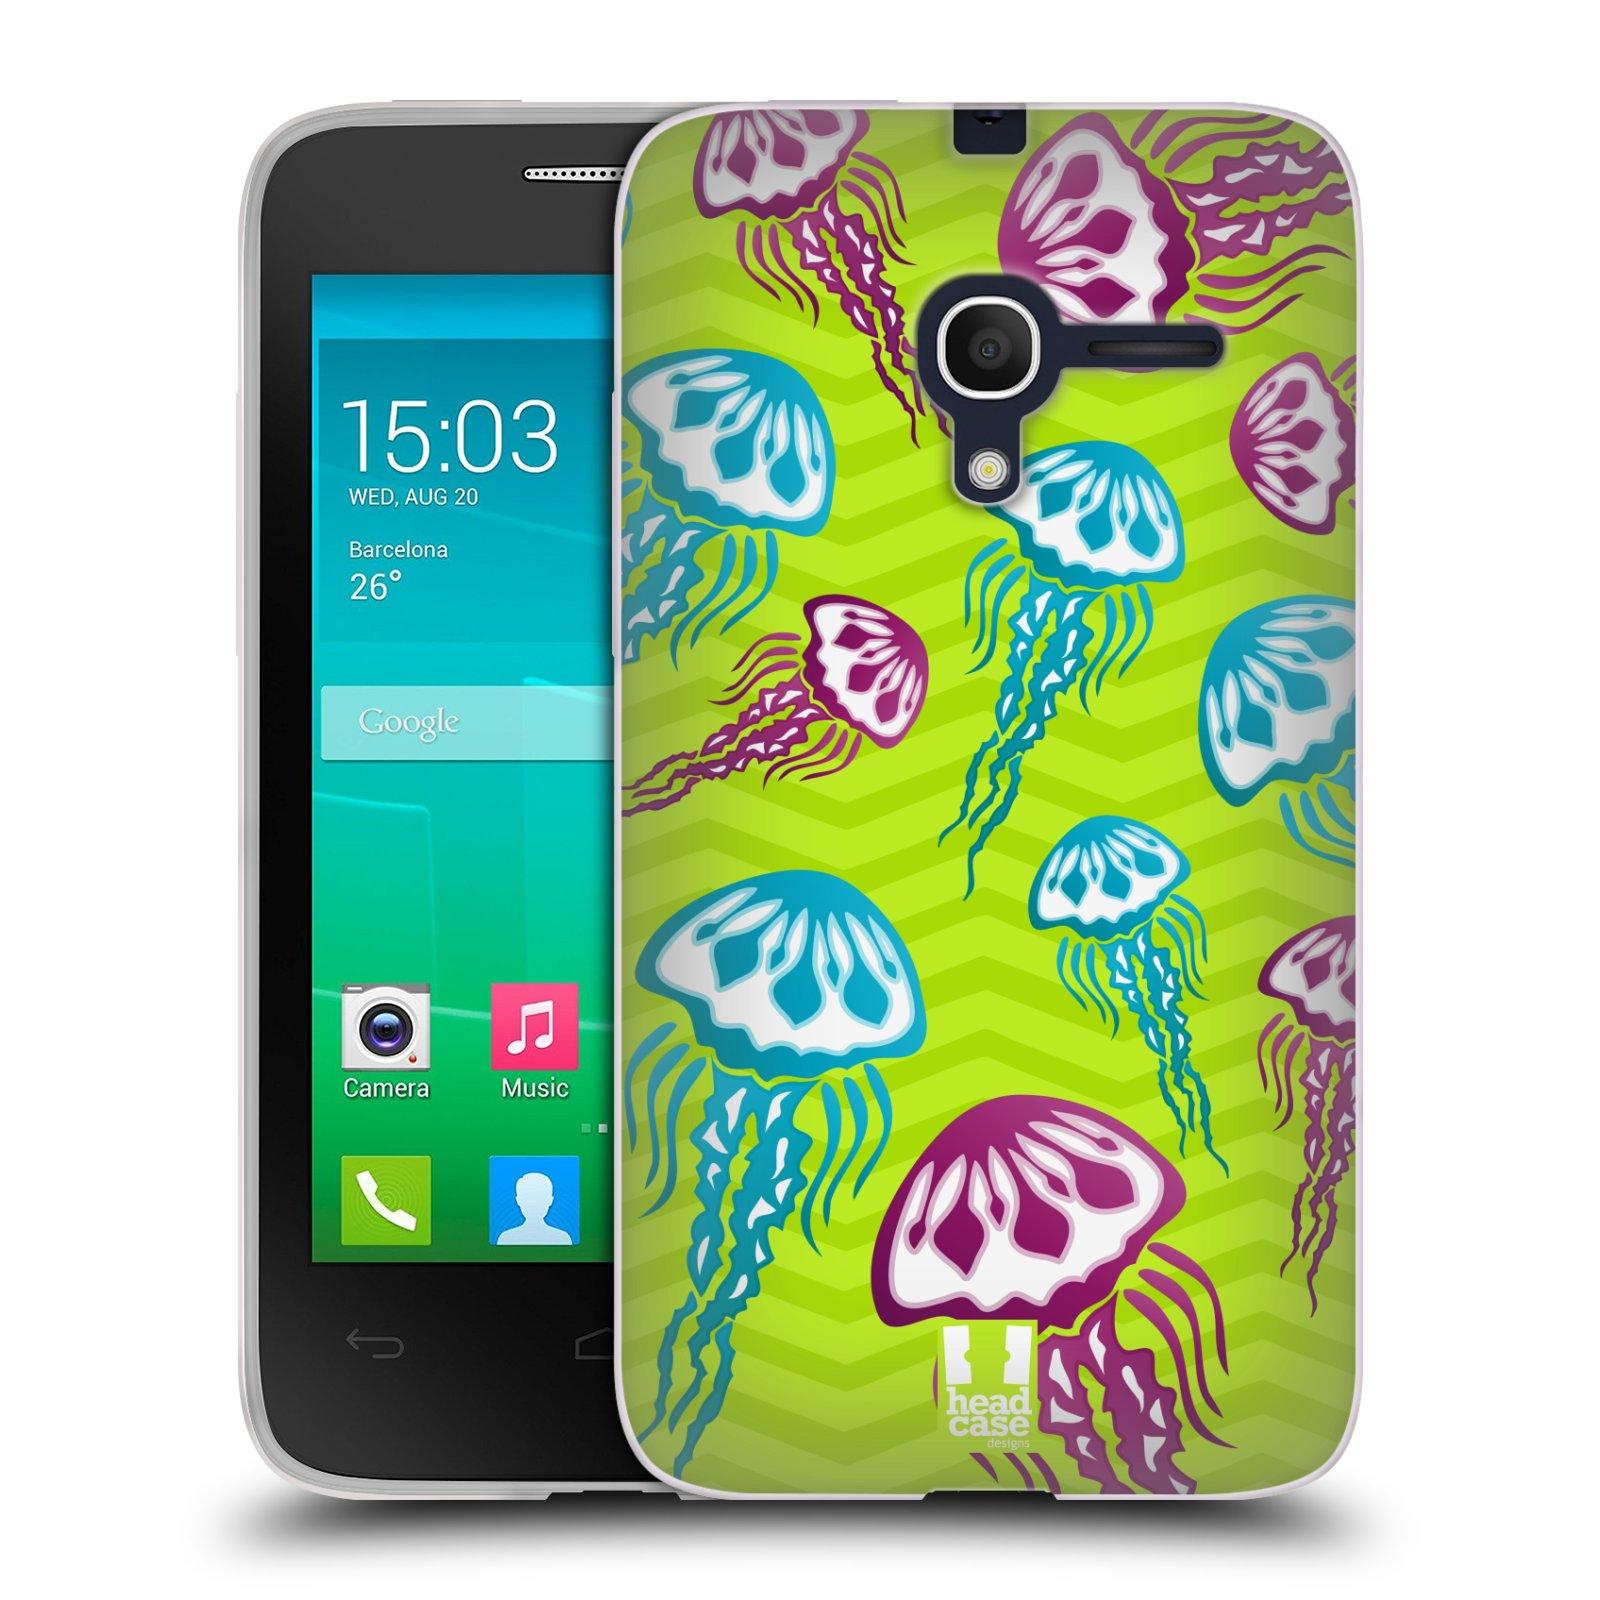 HEAD CASE silikonový obal na mobil Alcatel POP D3 OT-4035D vzor mořský živočich medůza